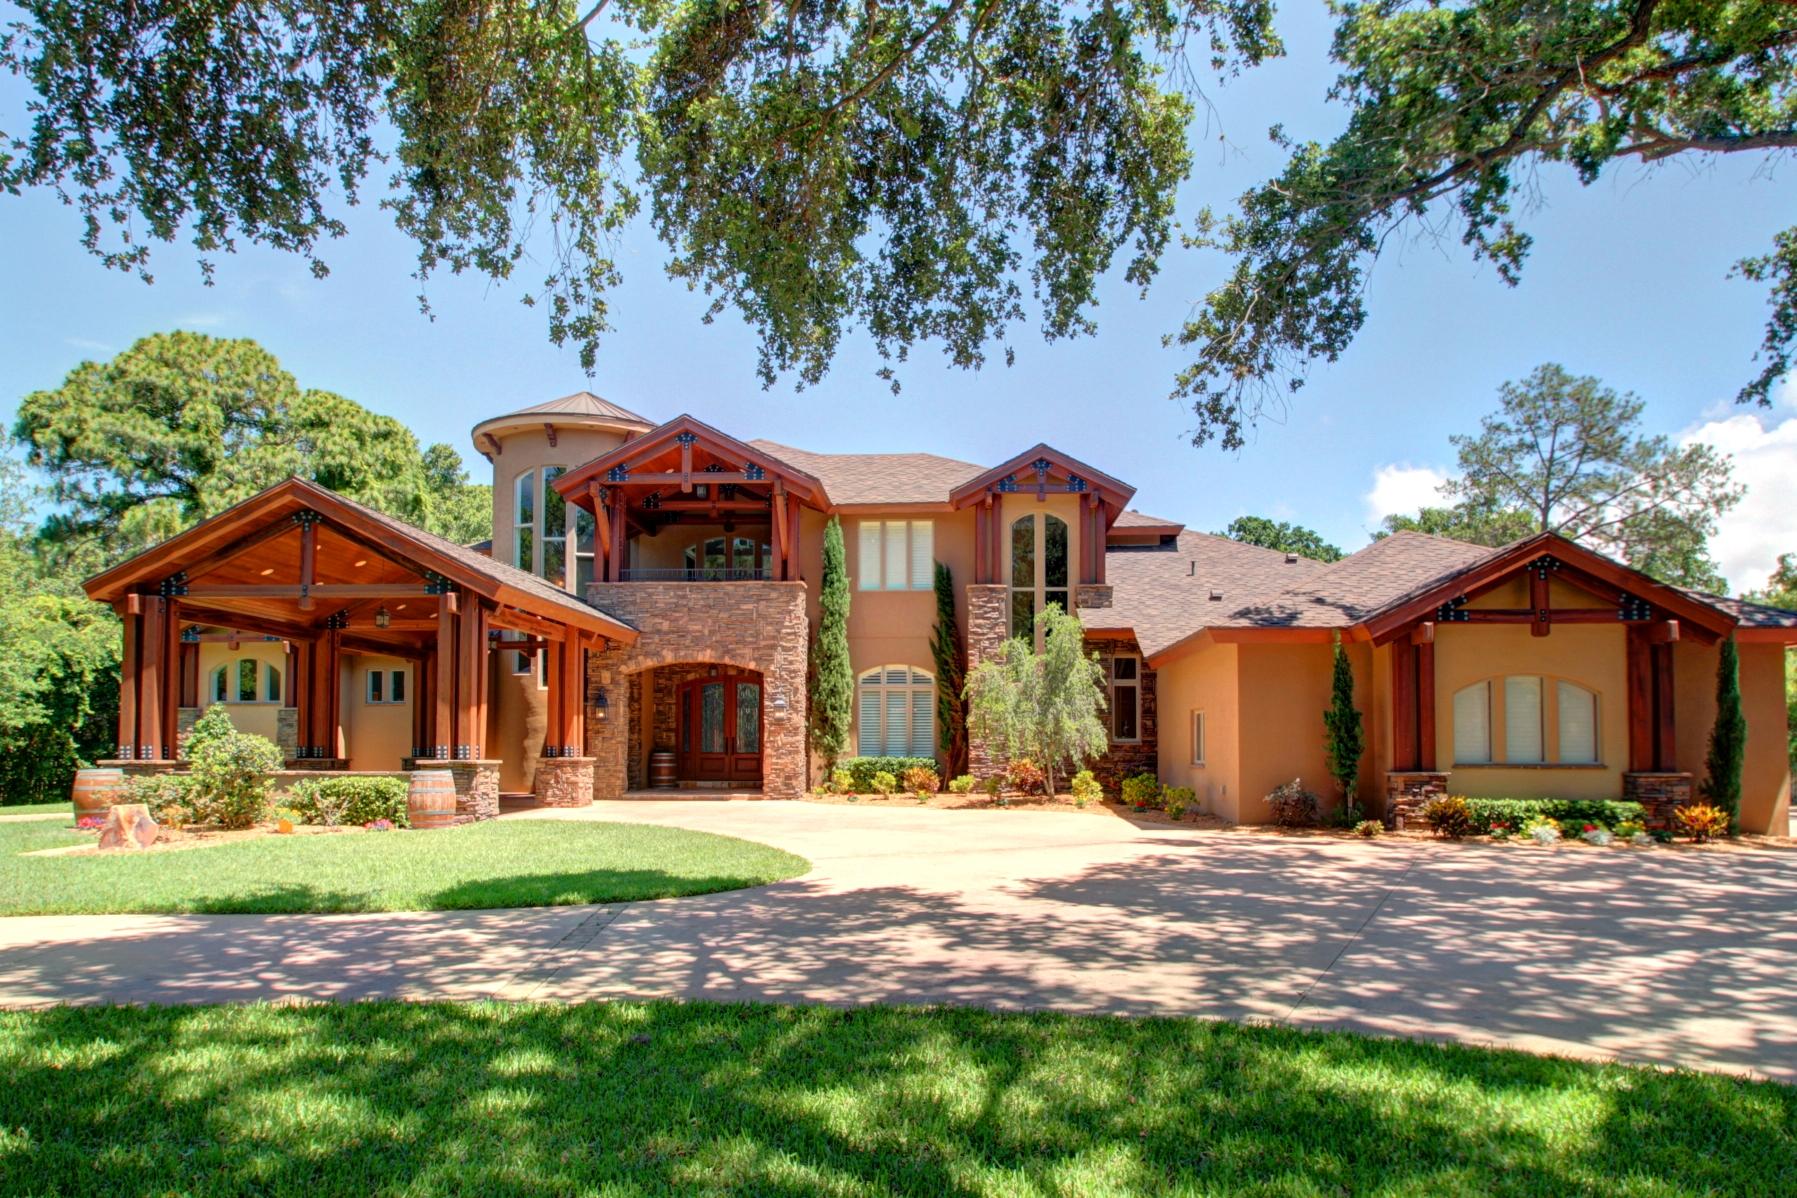 Sold for $1,450,000 in Seminole